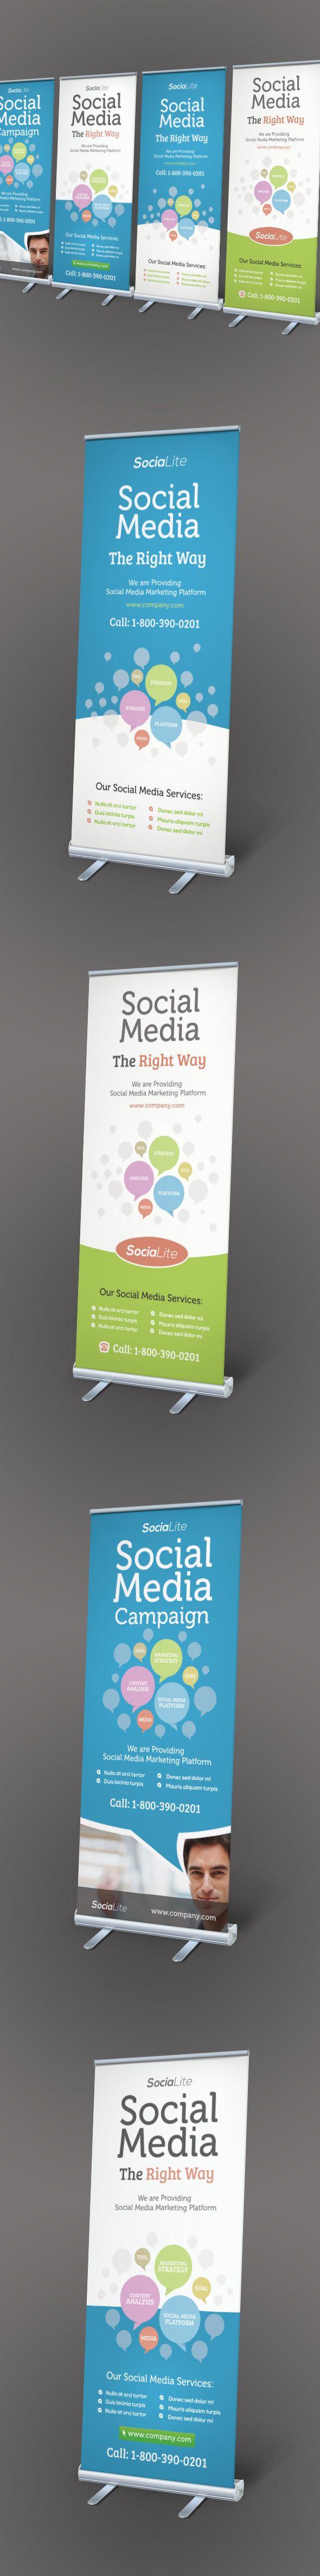 Social Media Marketing Roll-up Banners by Kinzi Wijaya, via Behance